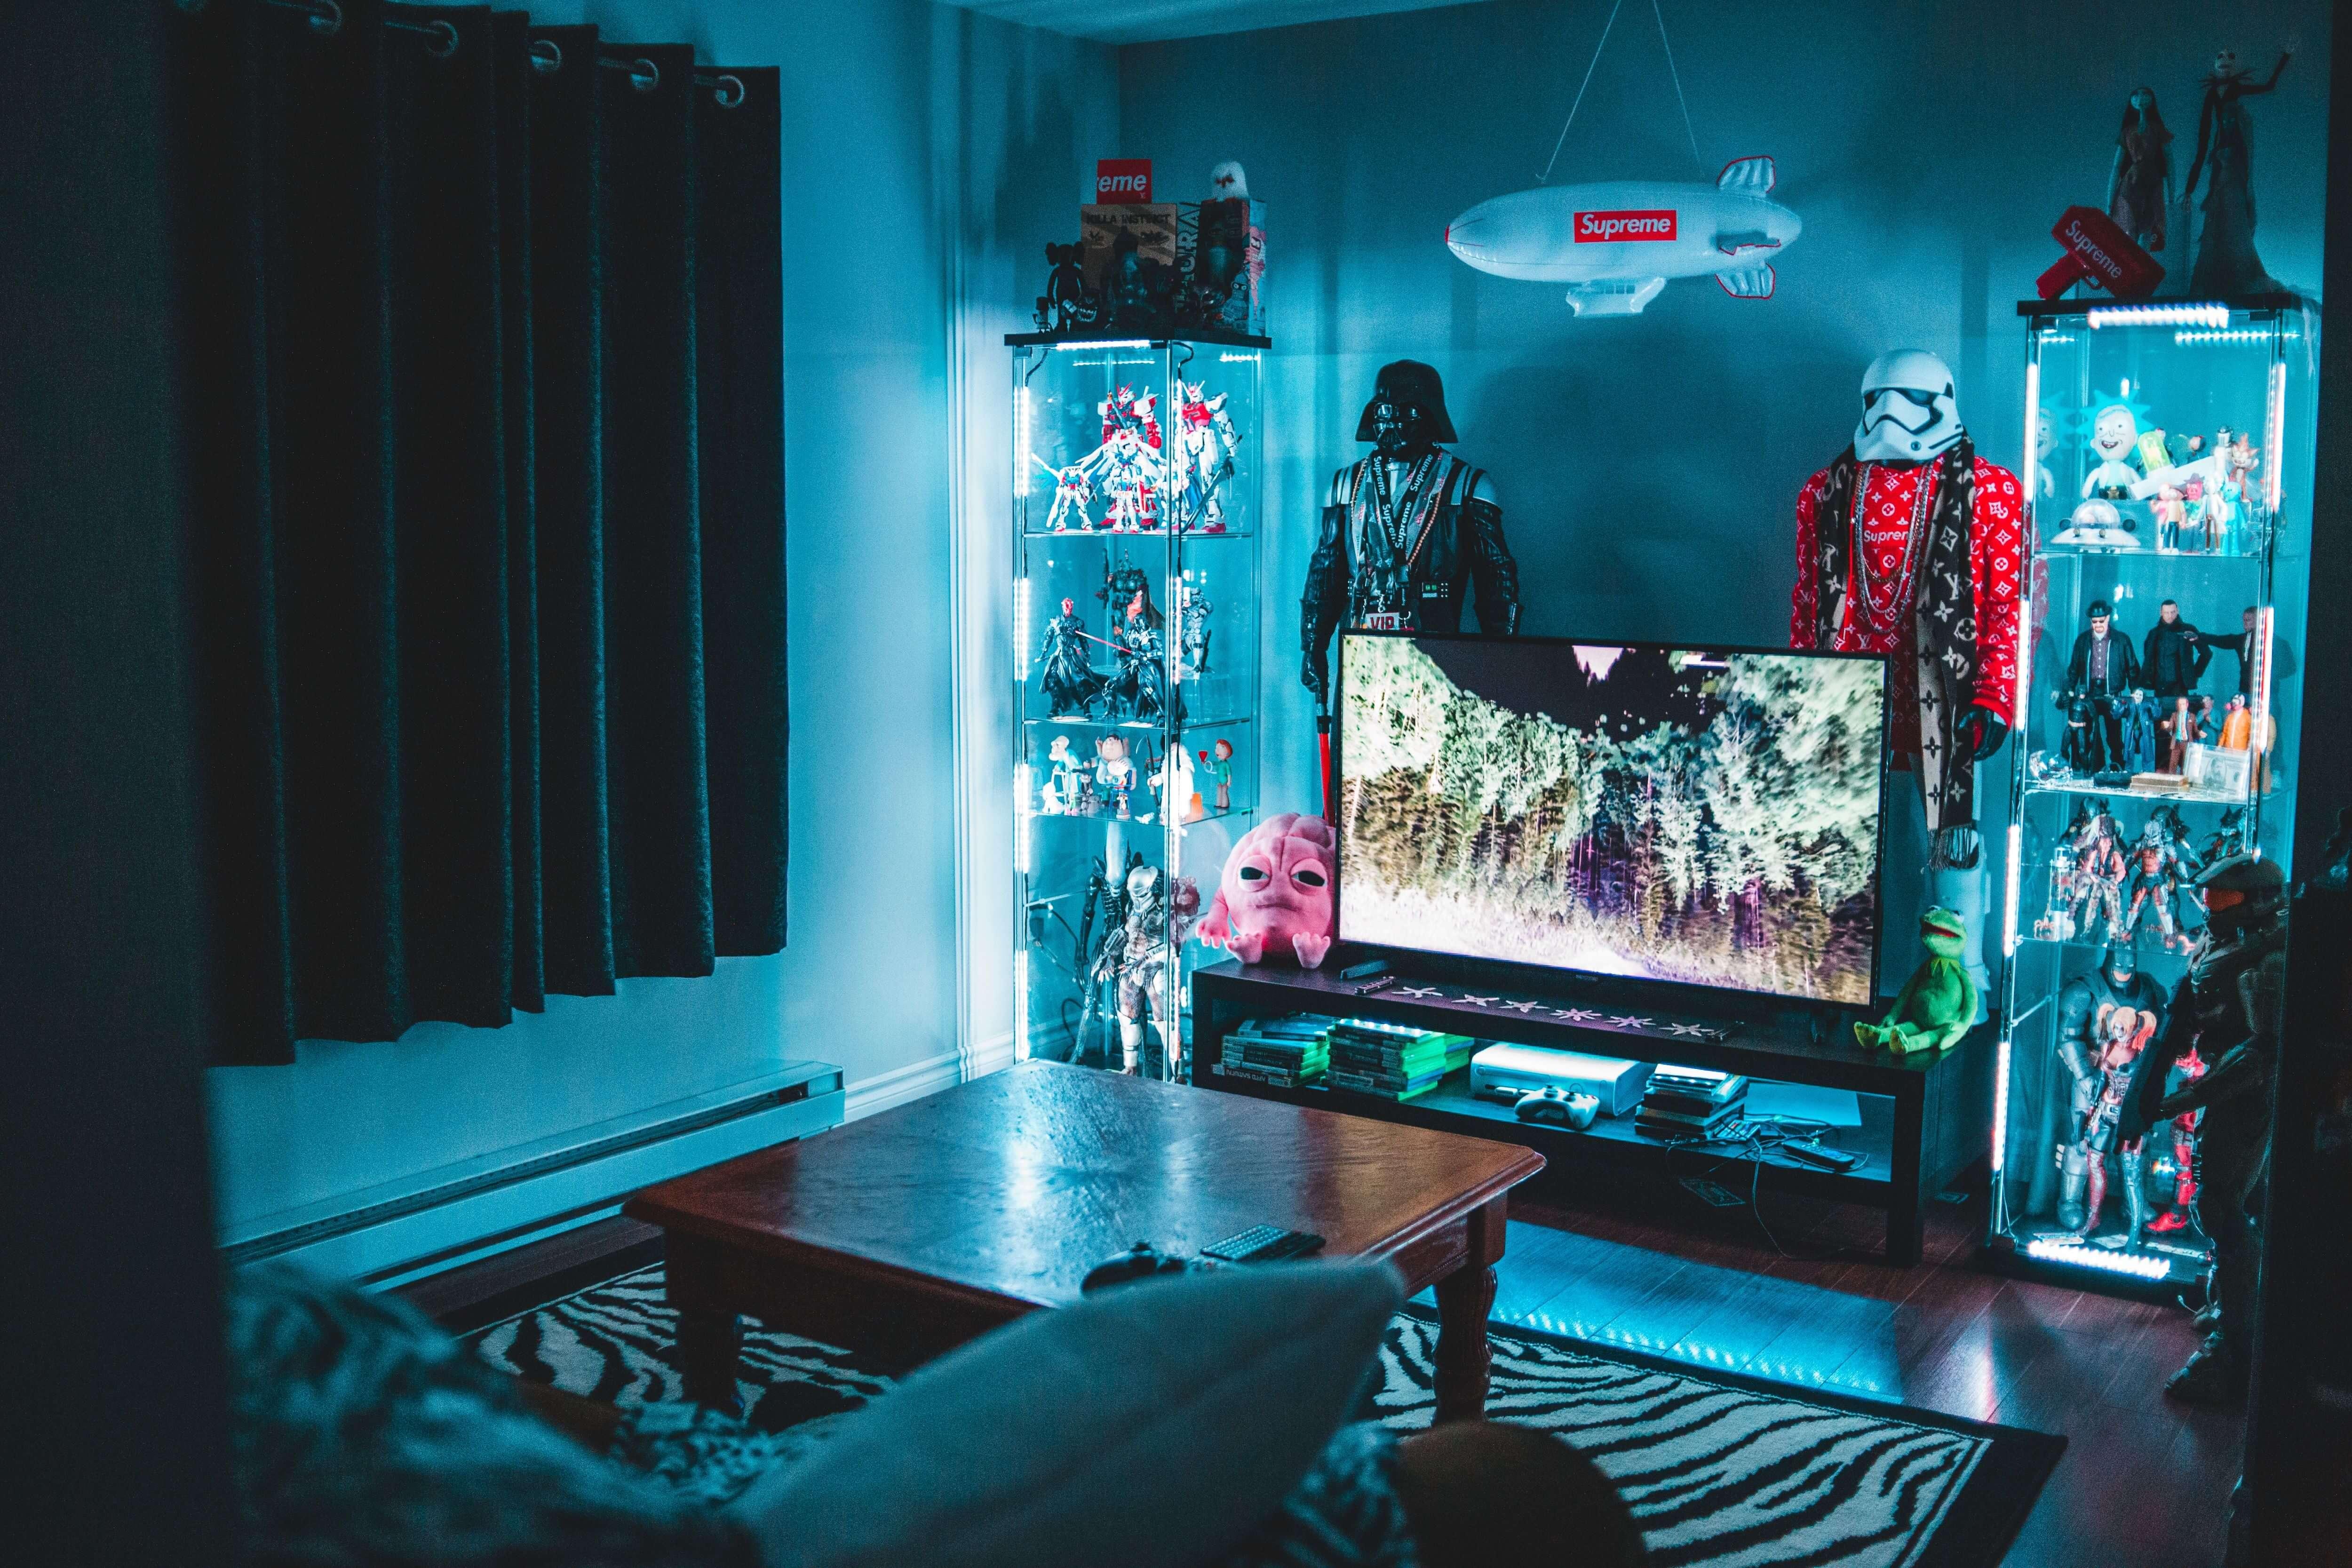 The Best TV and Internet Bundles in Australia - 2019